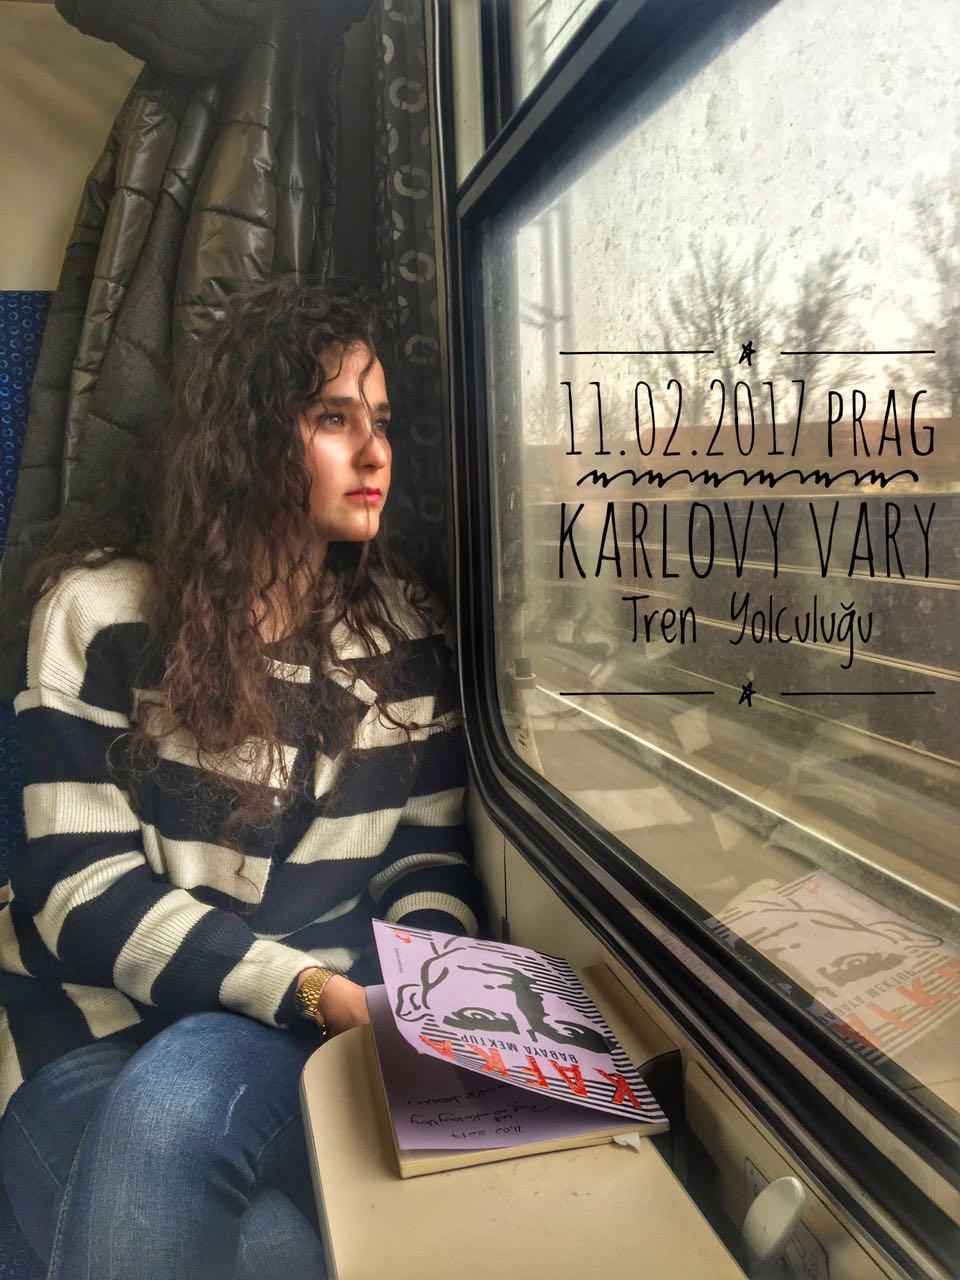 Prag Karlovy Vary Tren Yolculuğu